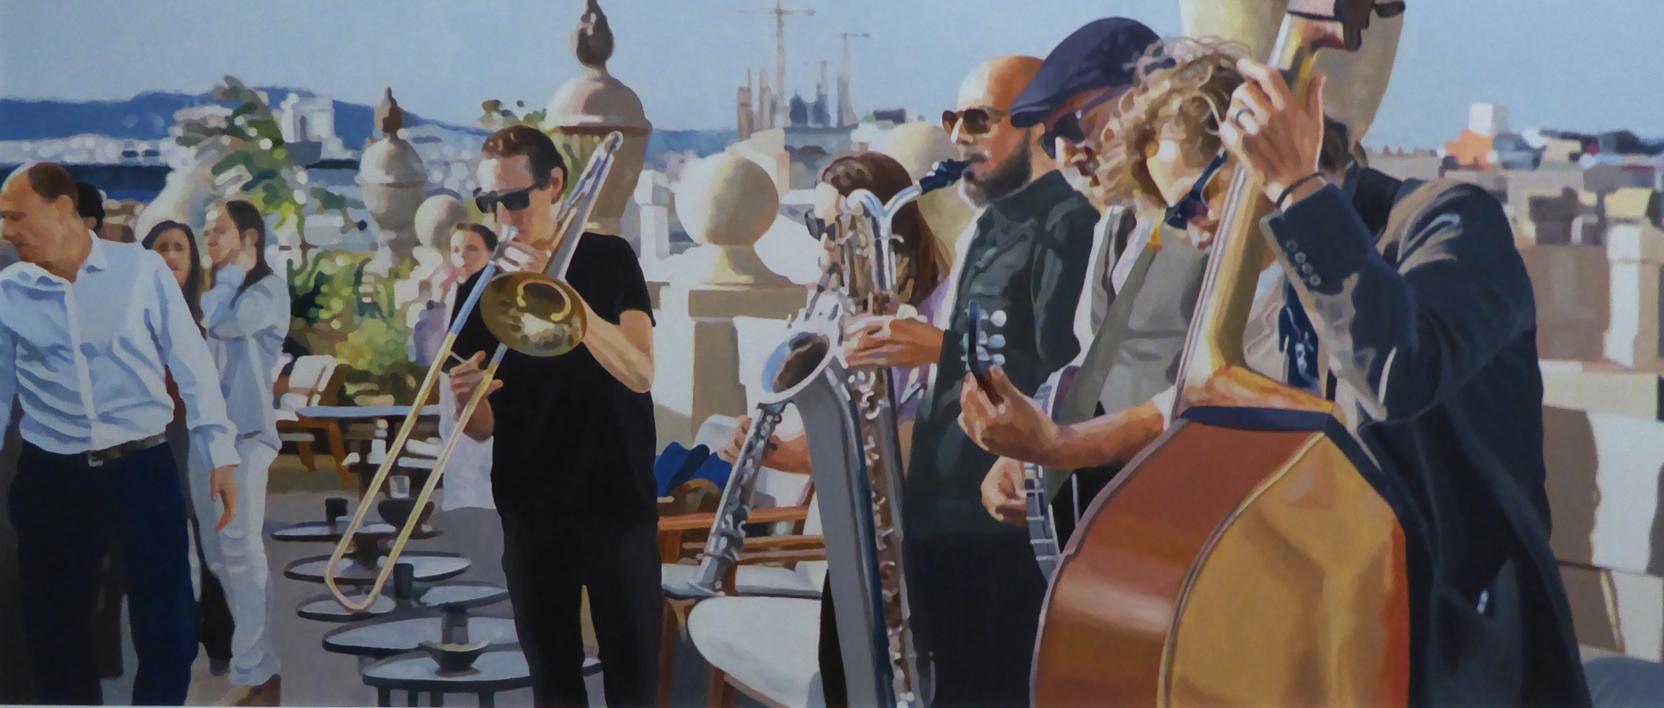 terraza con músicos |Pintura de Jose Belloso | Compra arte en Flecha.es